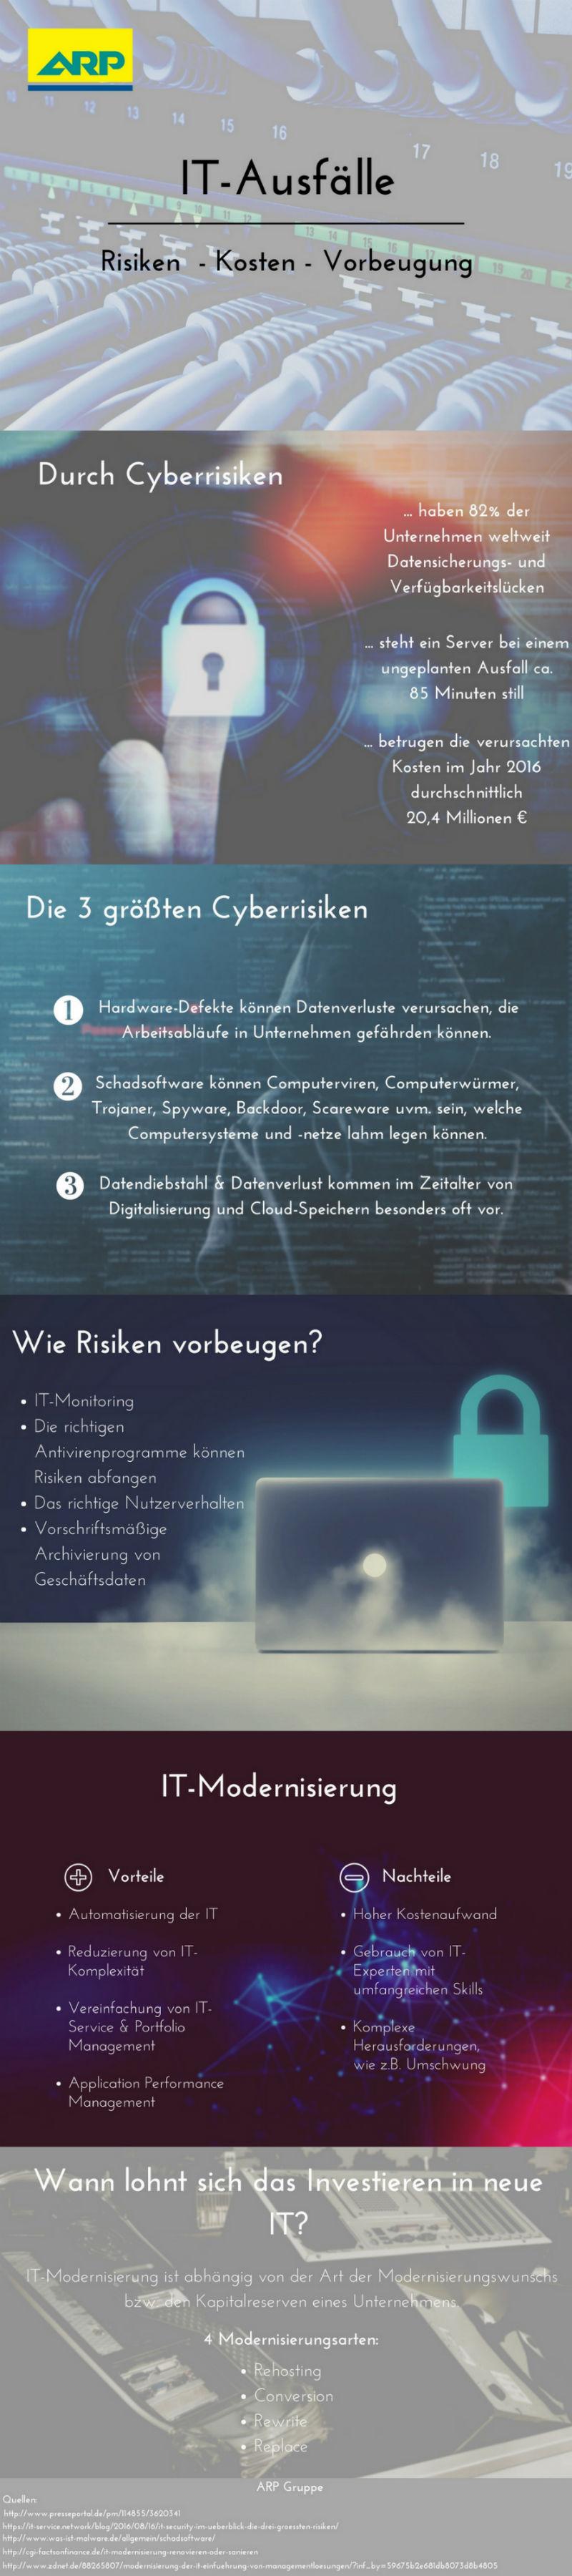 it-ausfaelle infografik